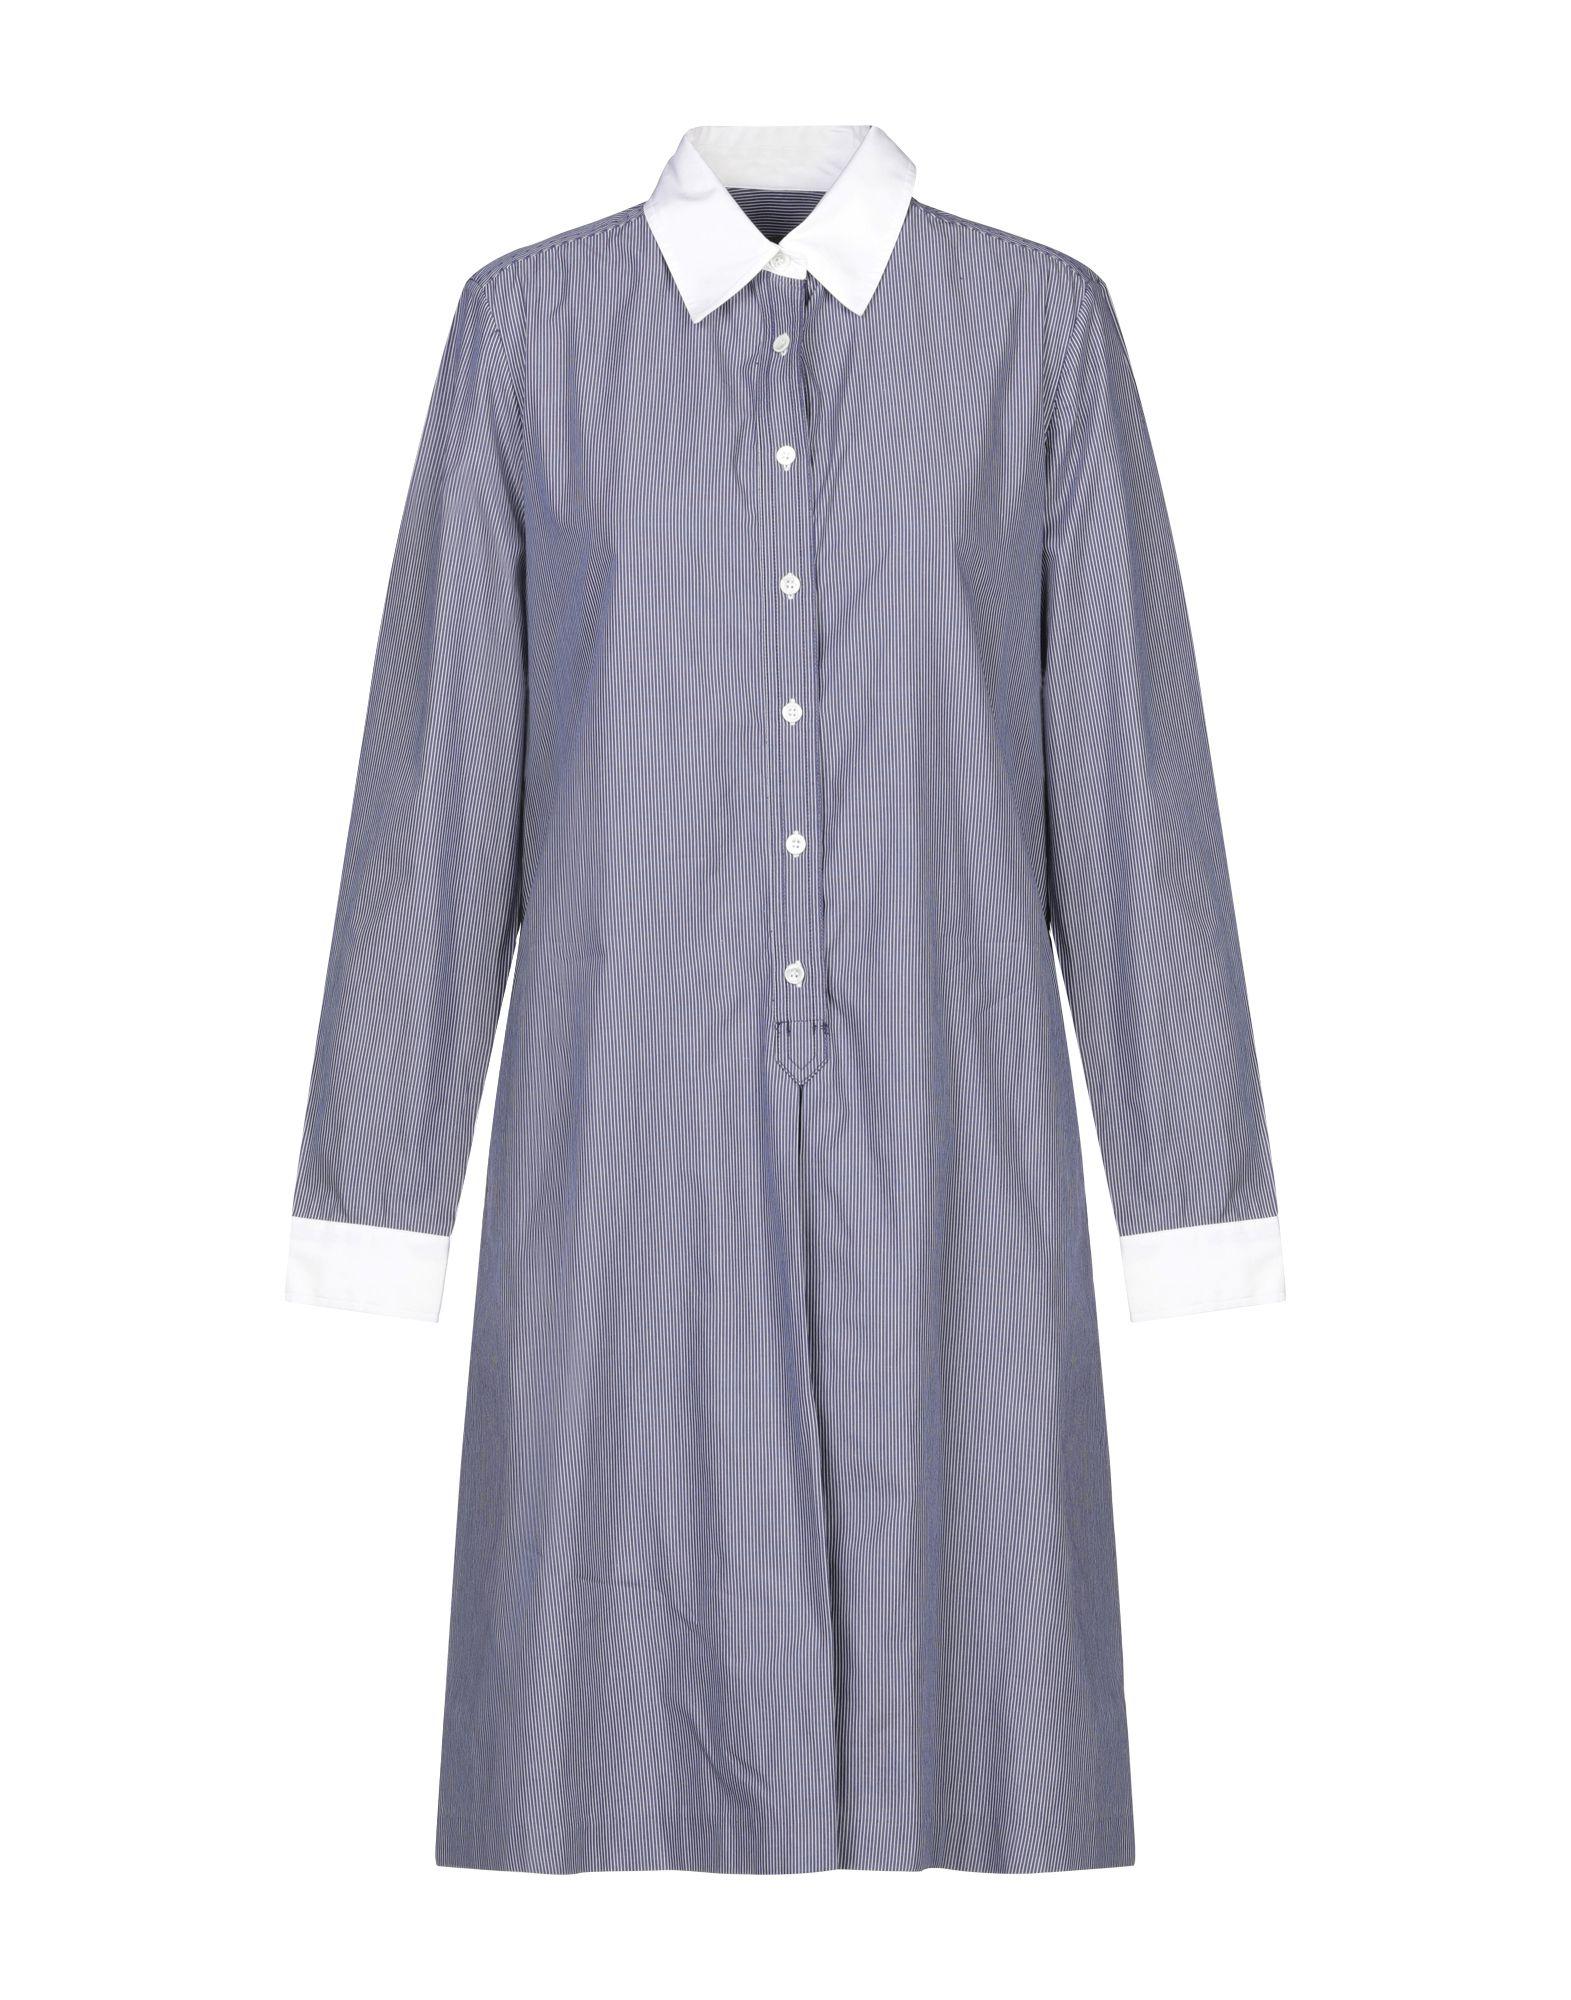 helen seward kapetil color VANESSA SEWARD Платье миди